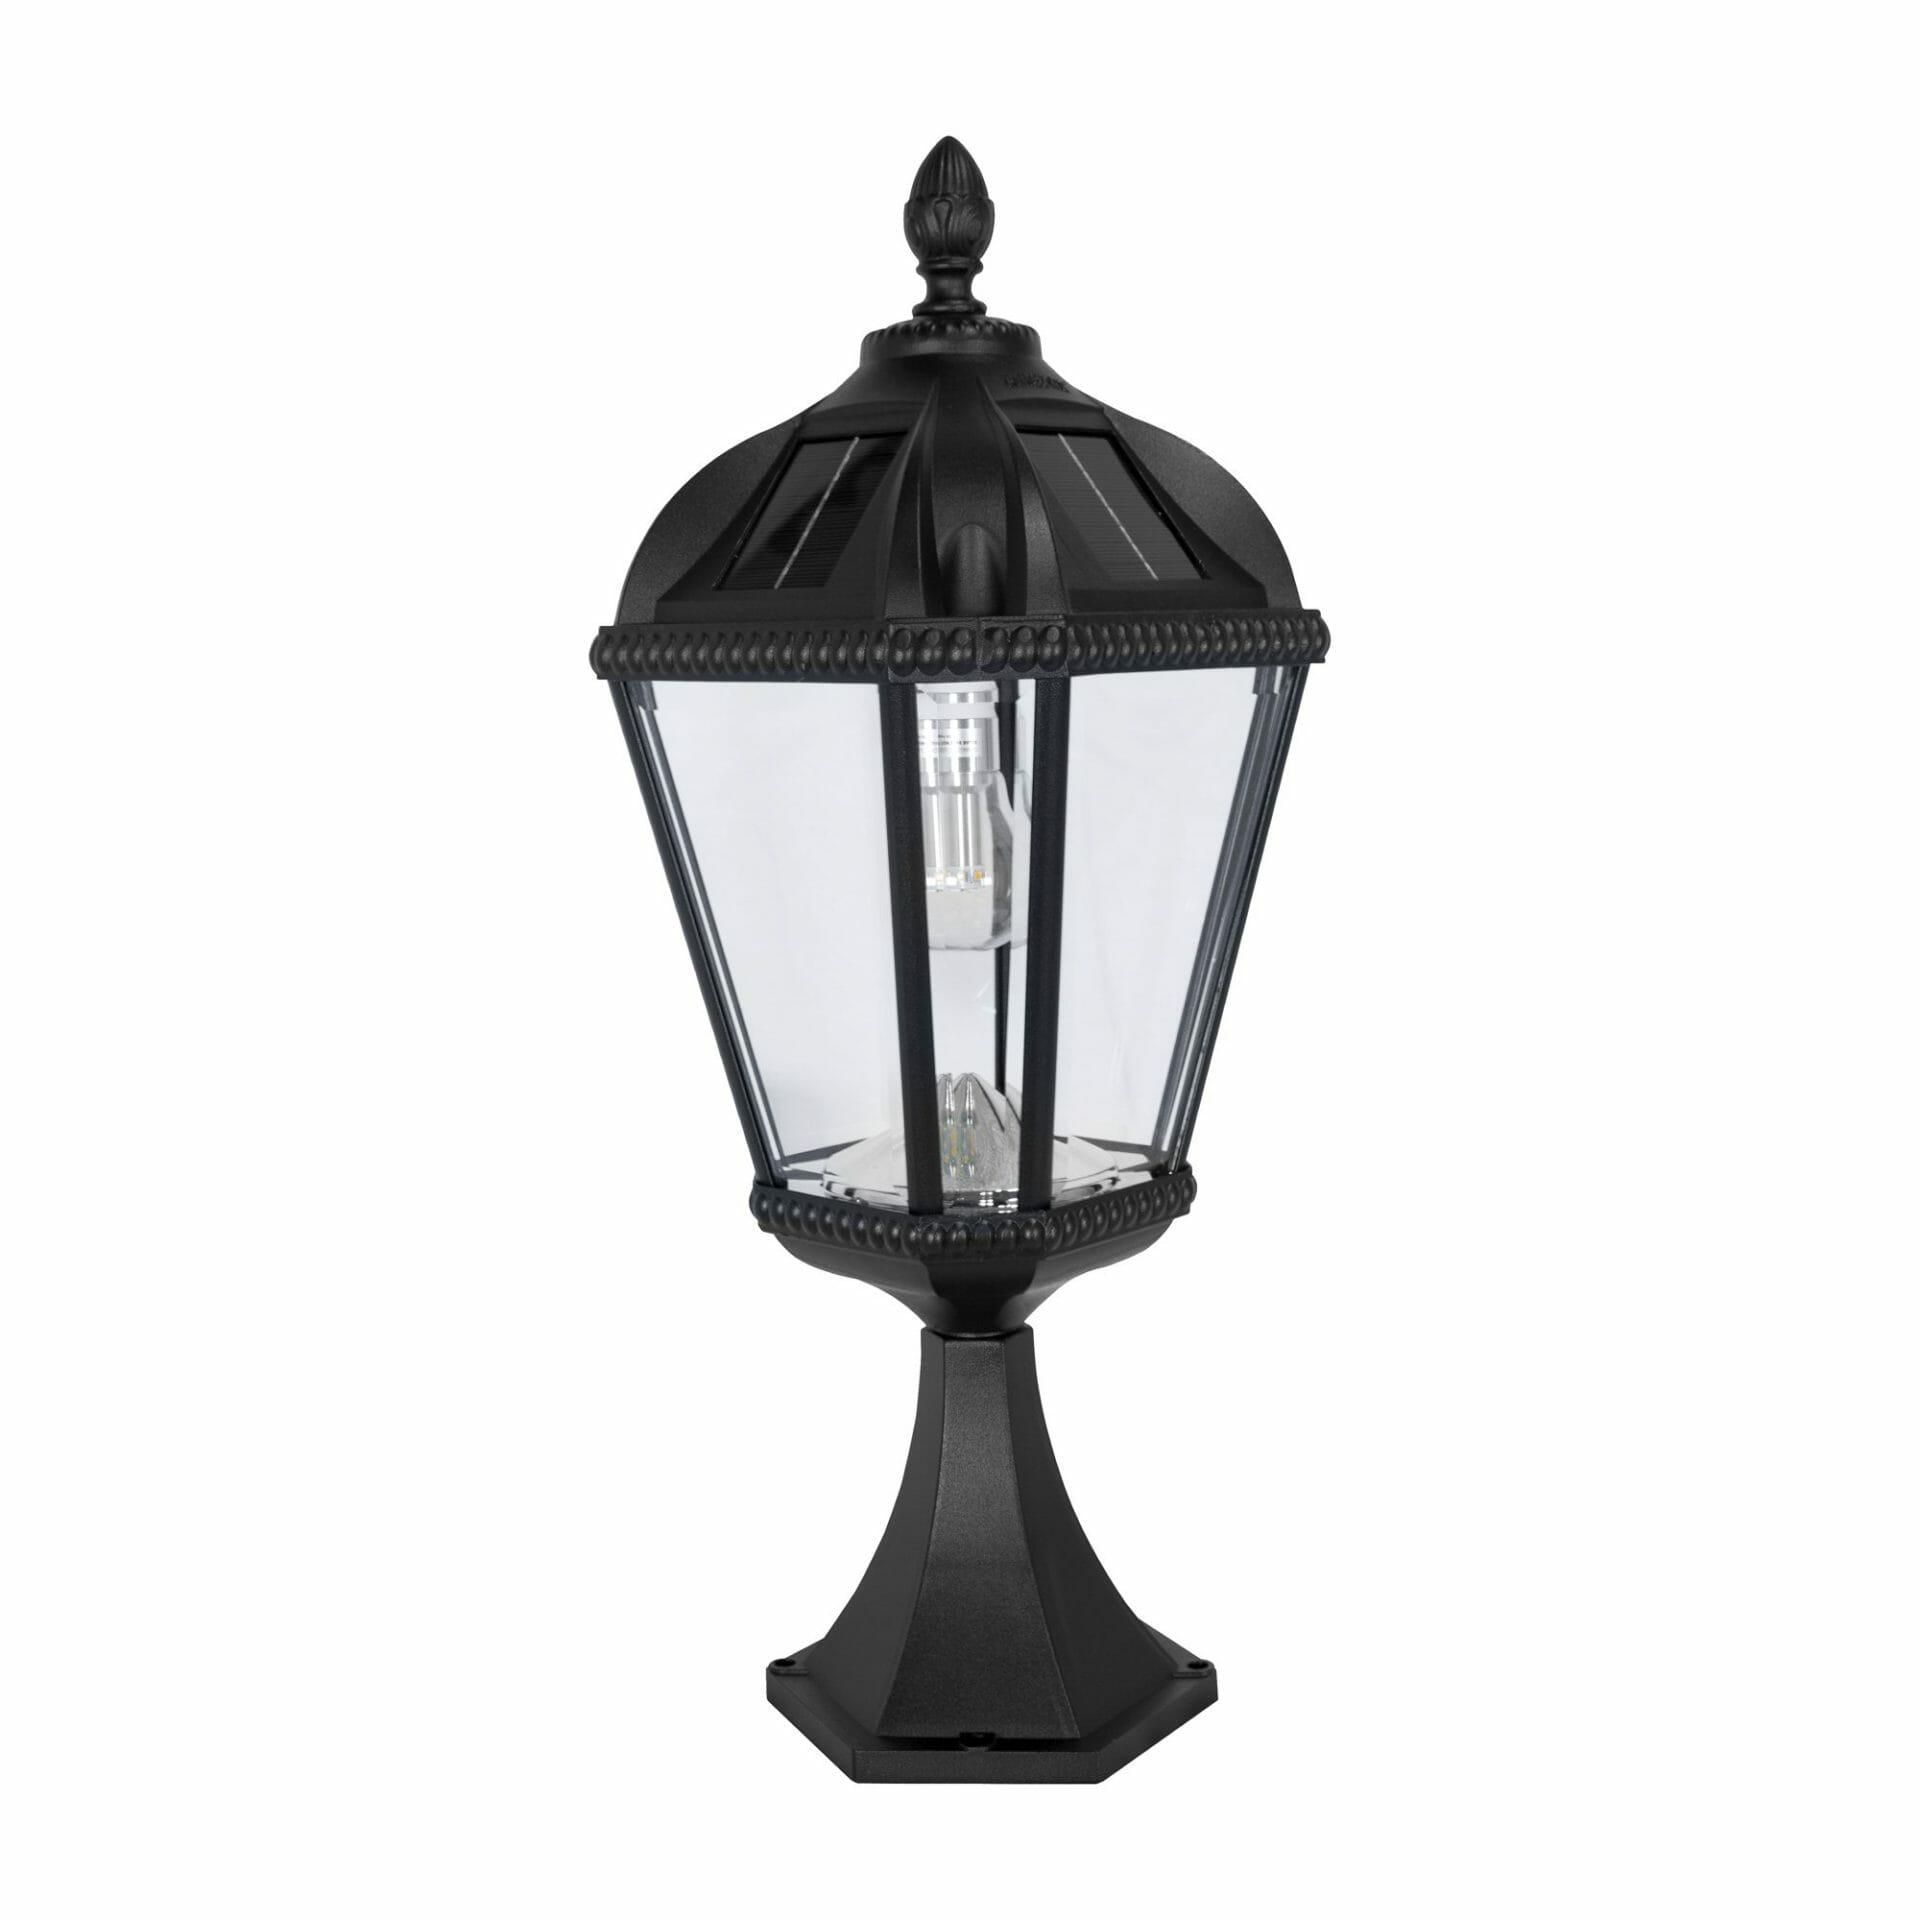 royal-bulb-pier-mount-solar-lamp-with-gs-solar-led-light-bulb-black-98b011